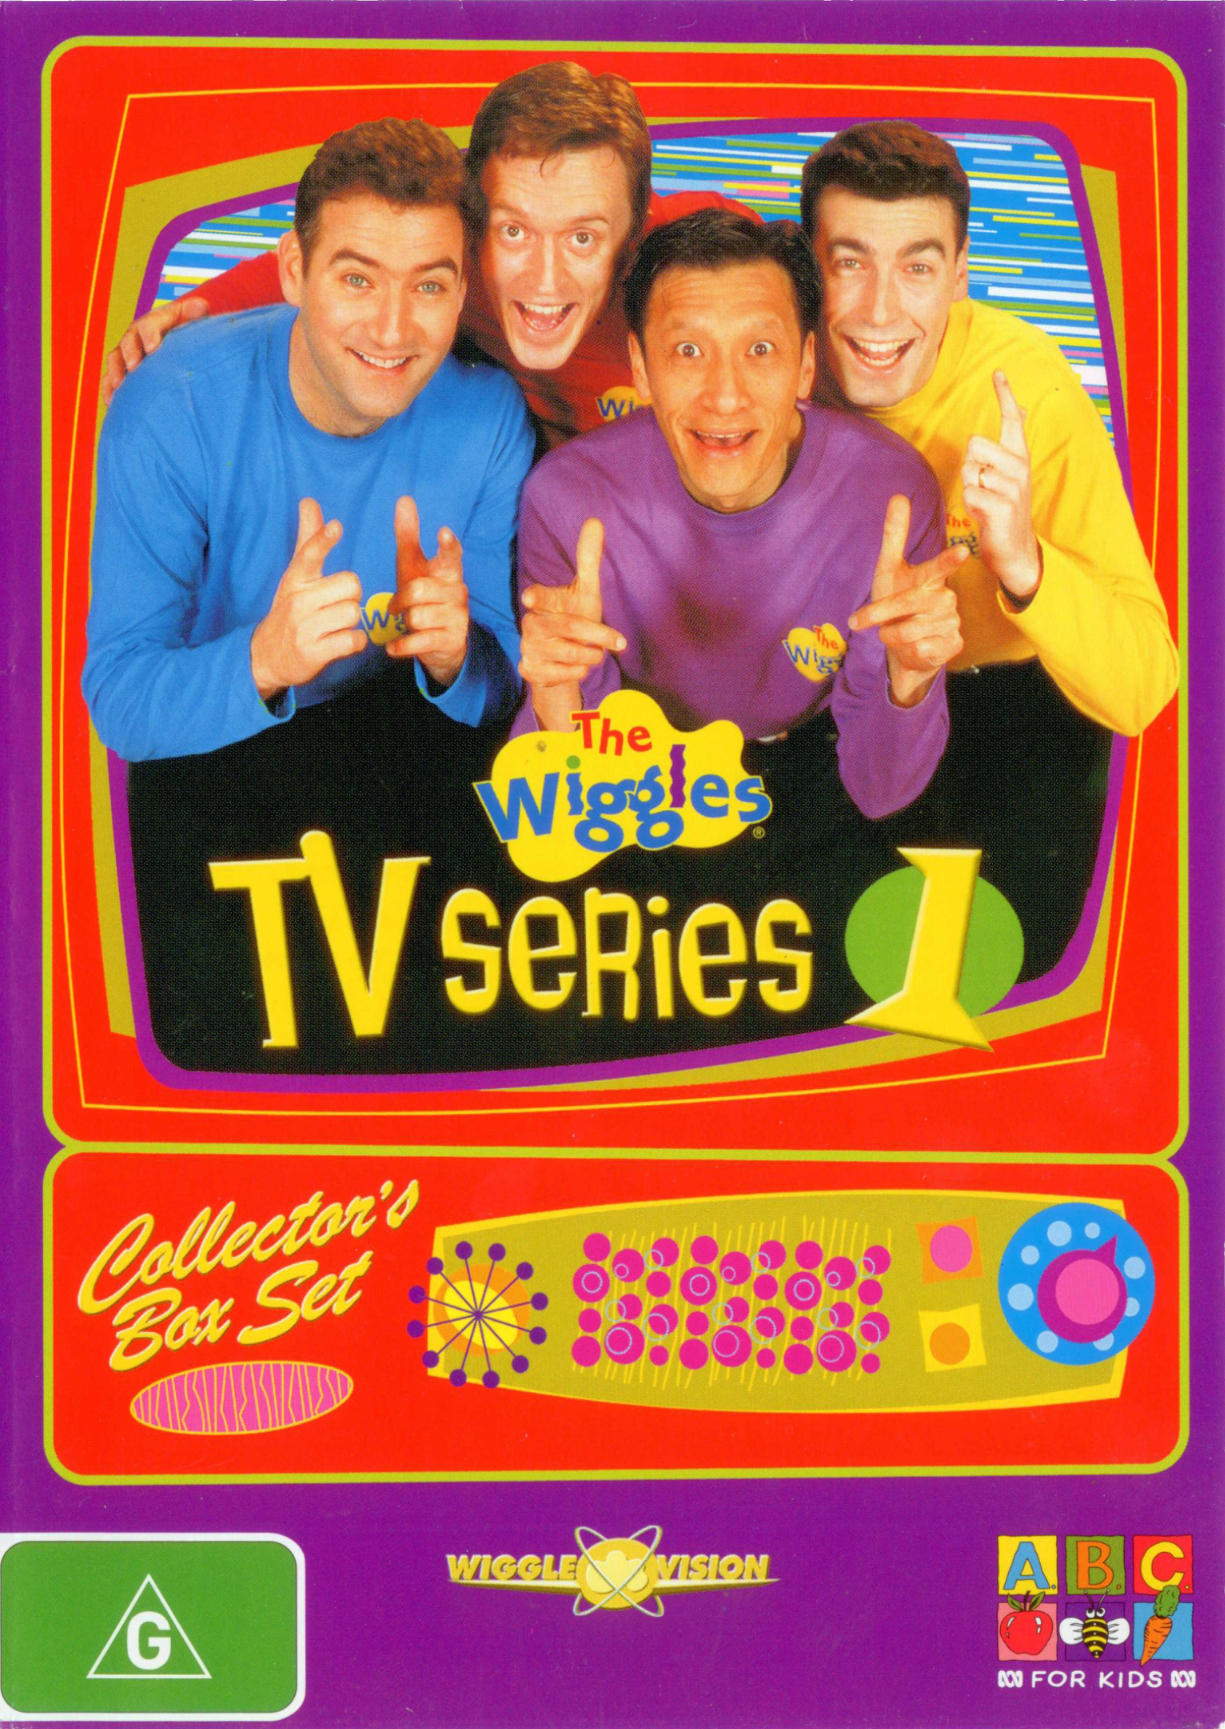 TV Series 1 Collector's Box Set